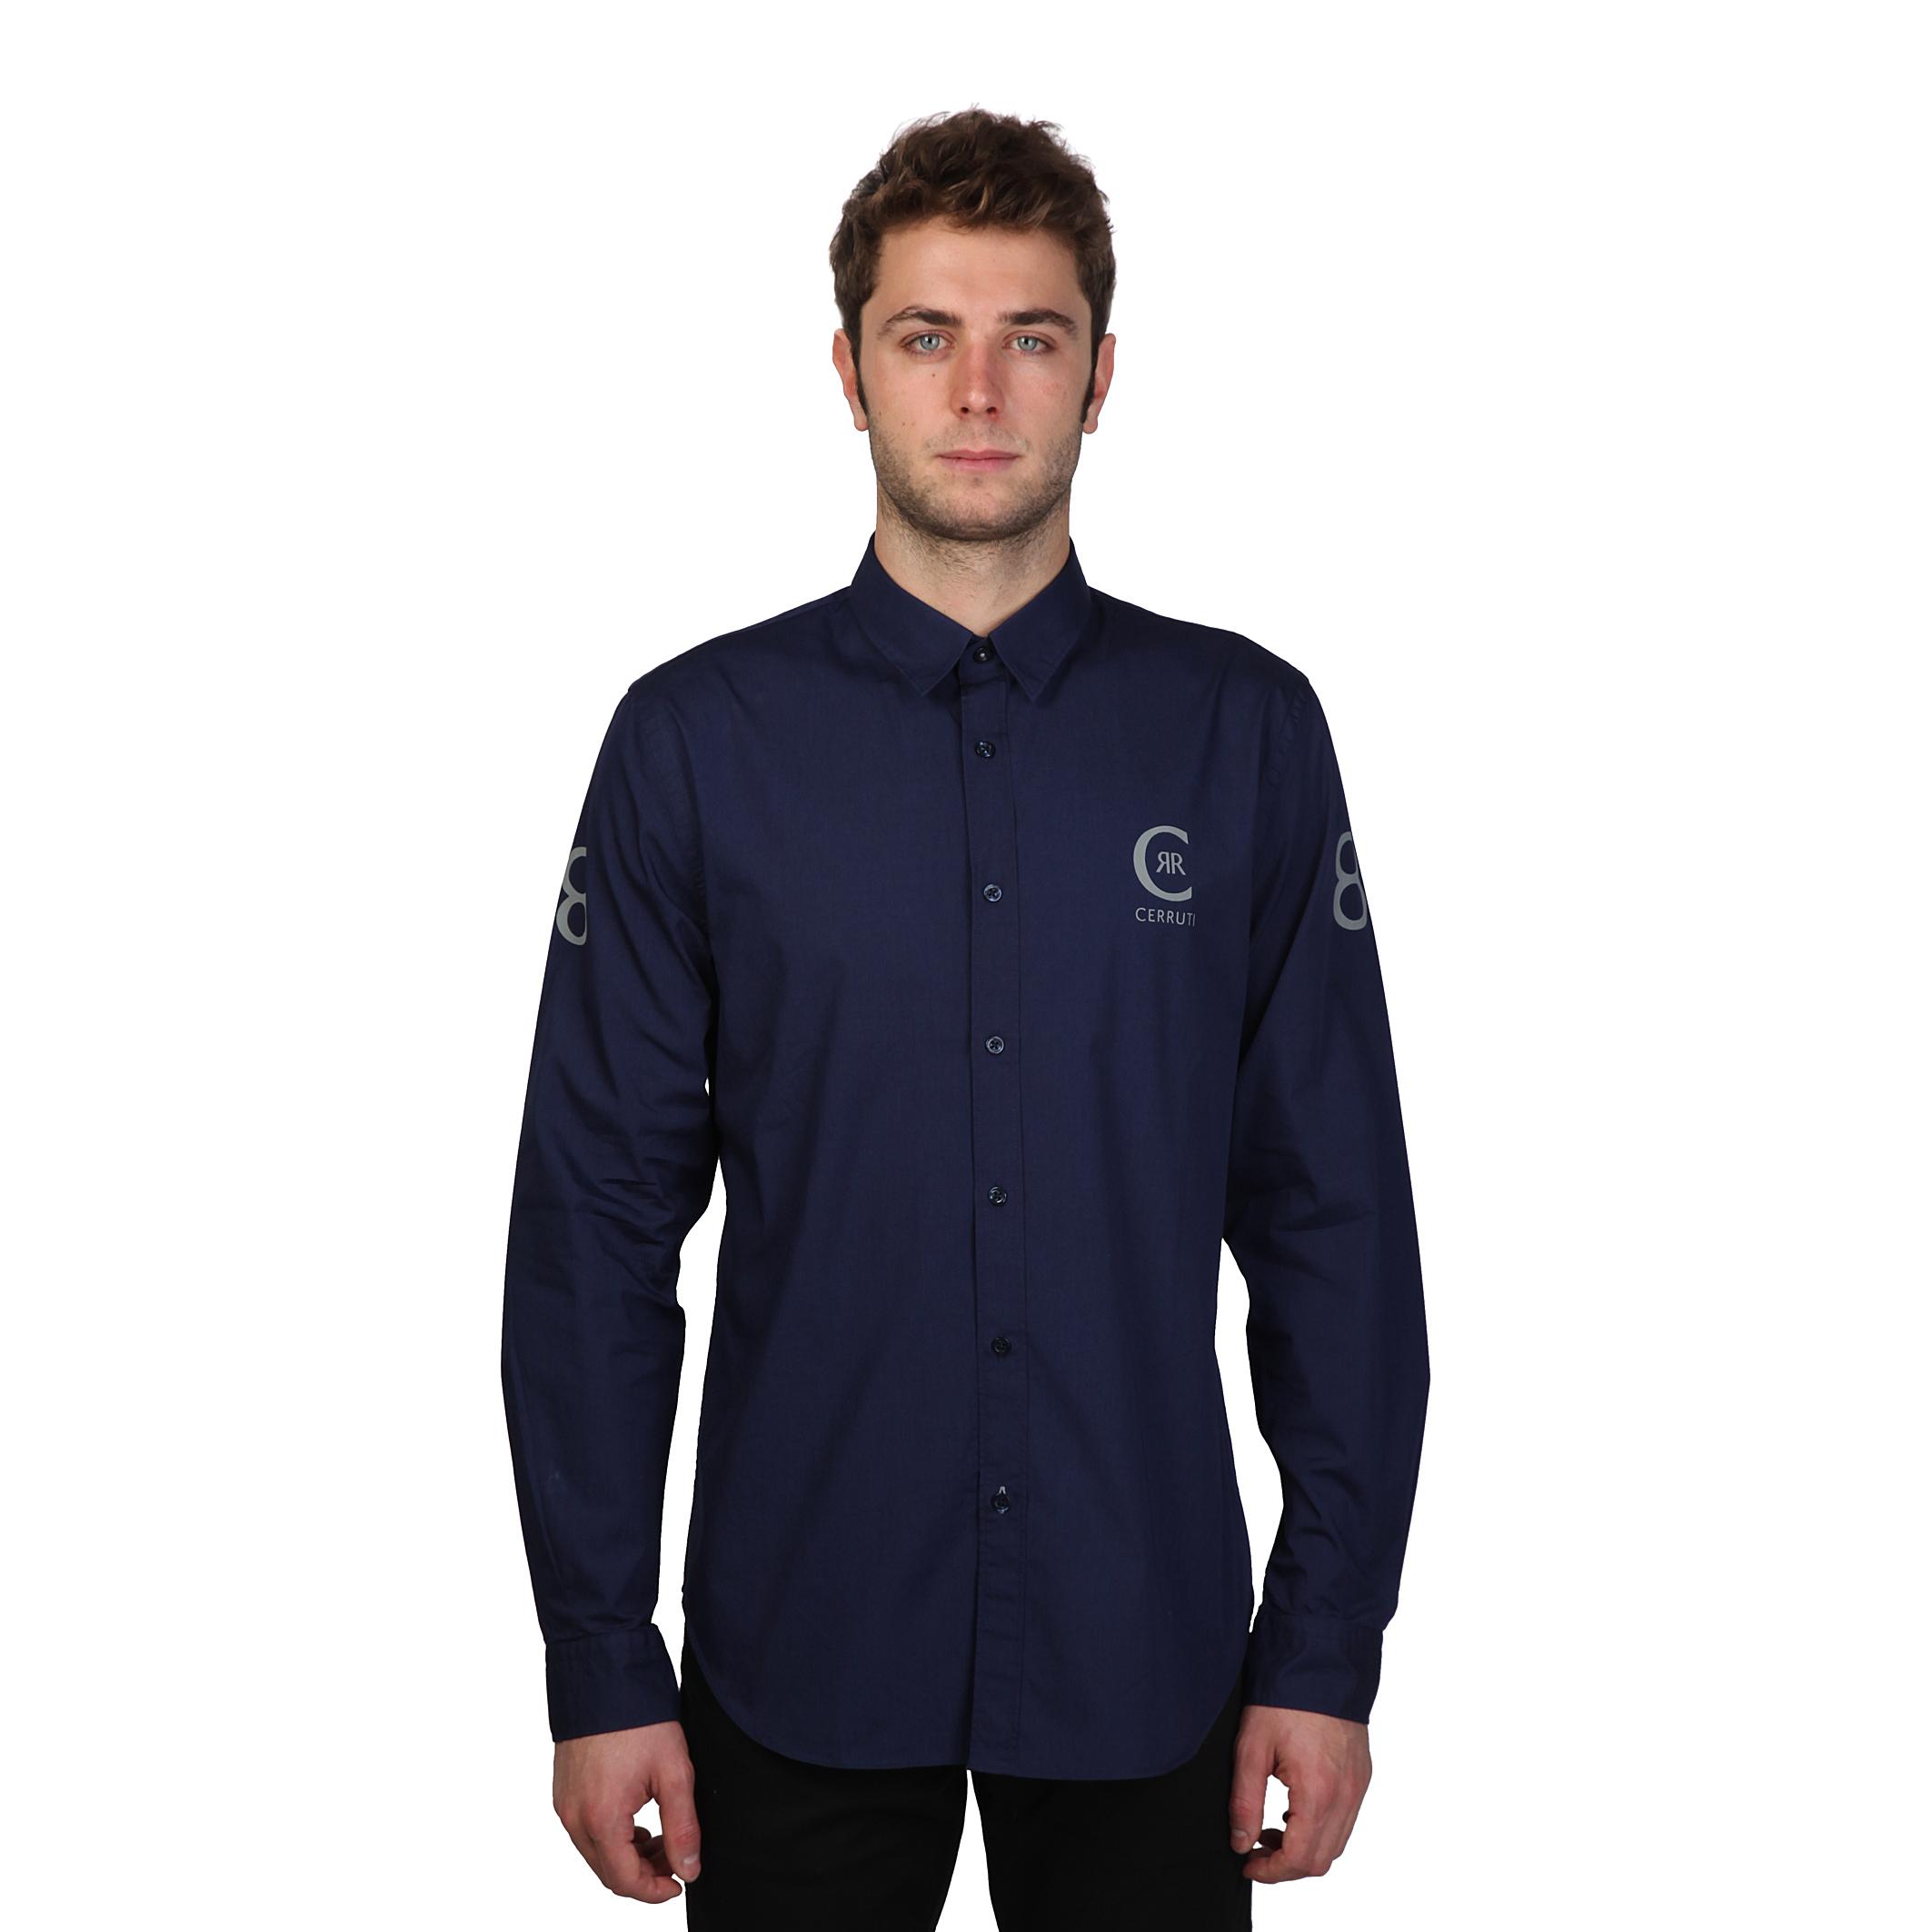 Cerruti 1881 mens casual plain long sleeve cotton shirt for Mens long sleeve casual cotton shirts